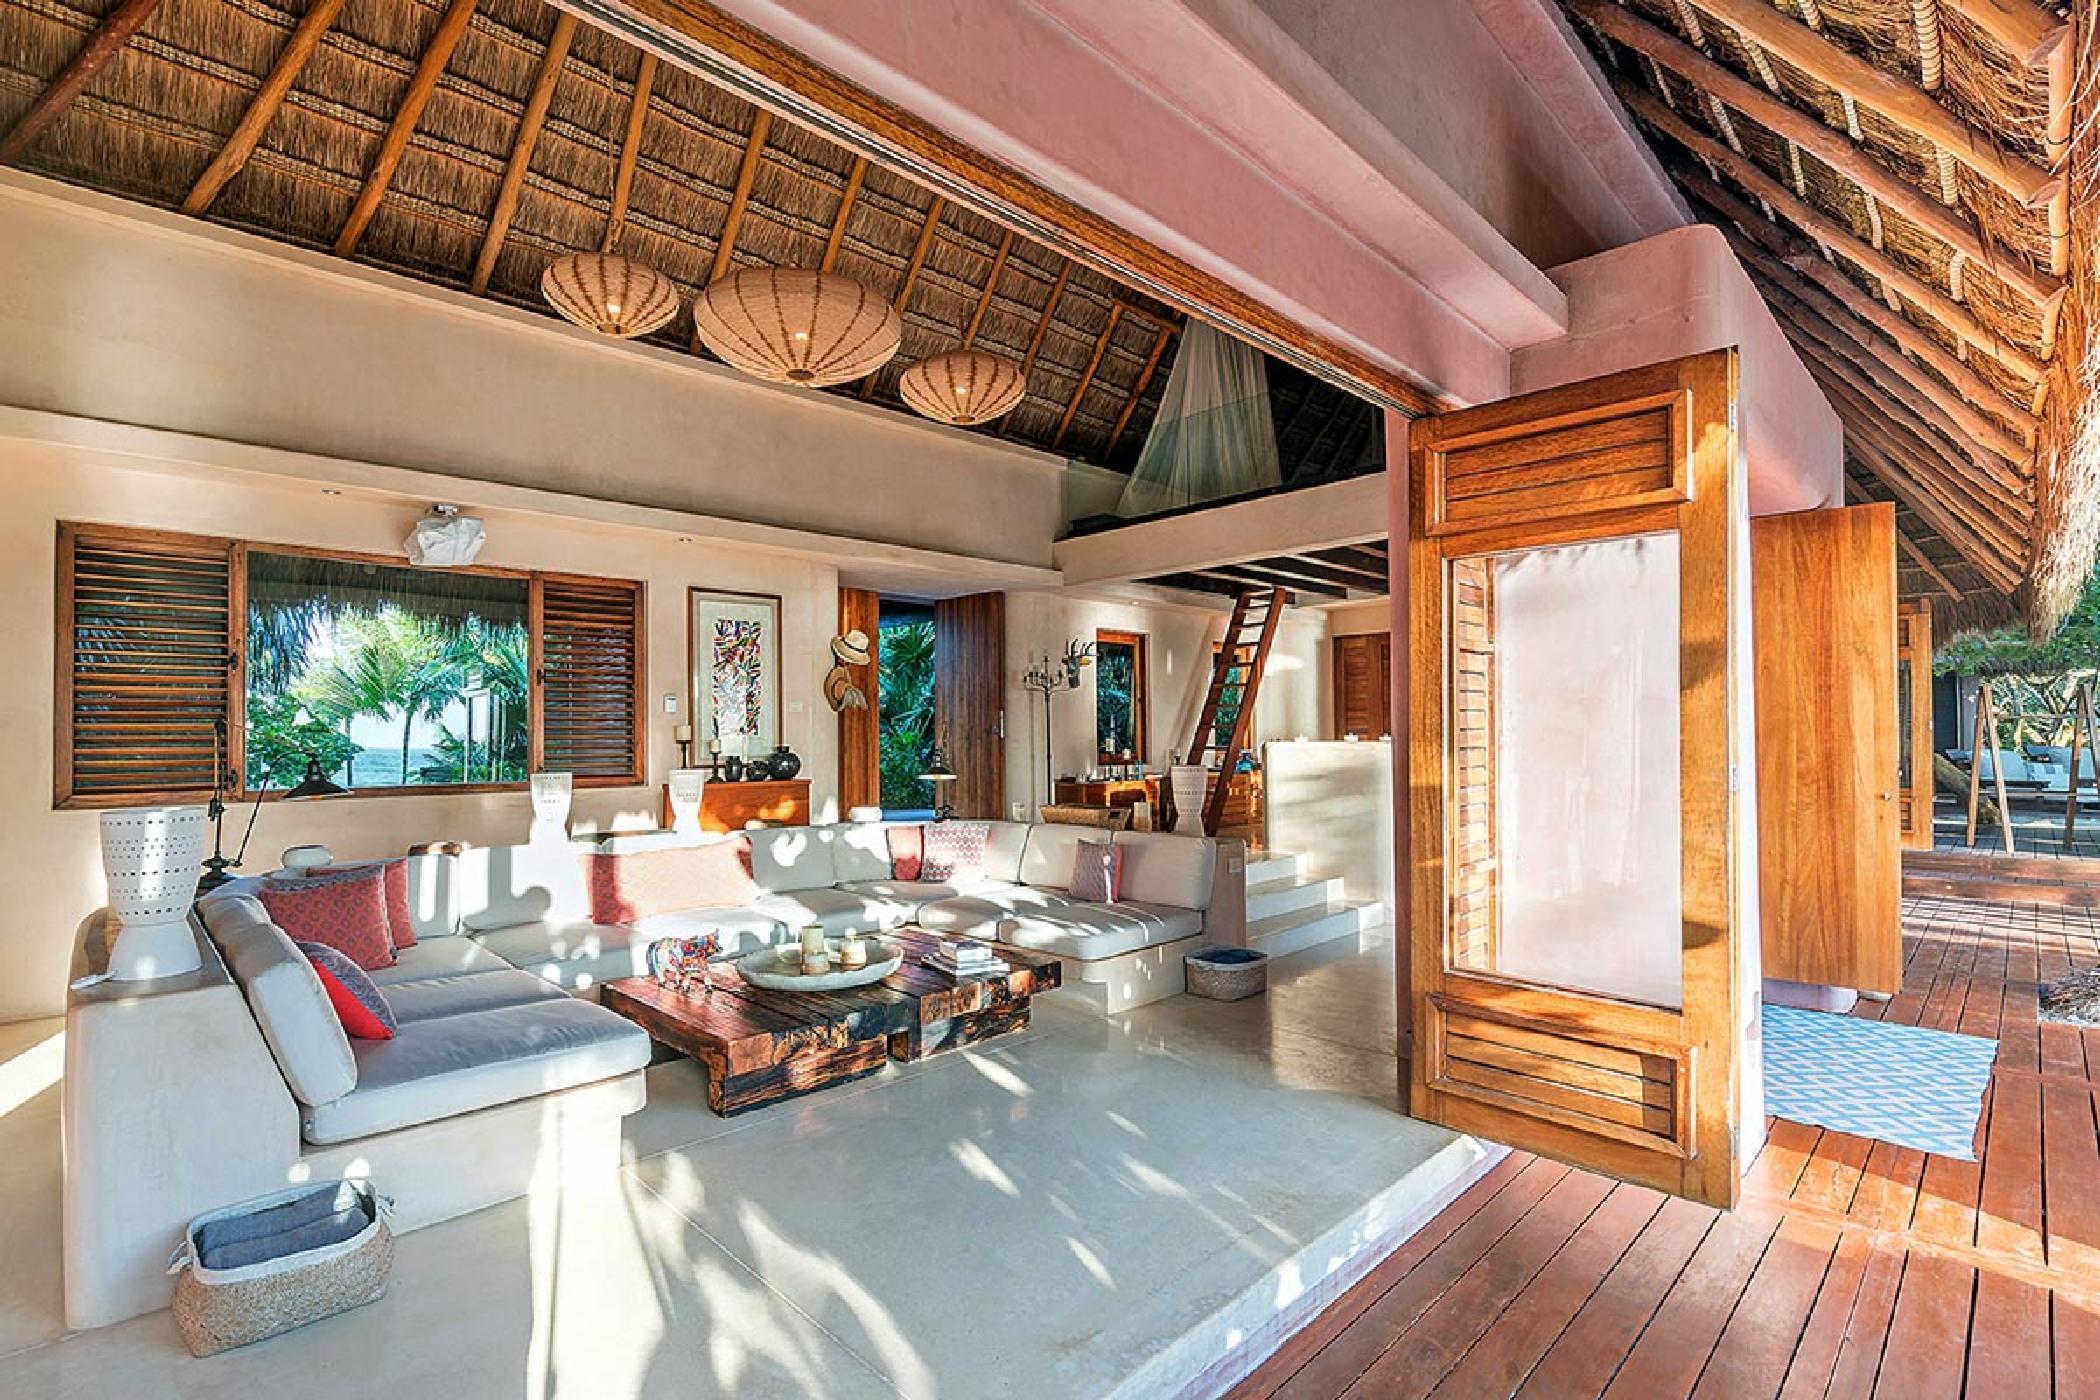 Maya_Luxe_Riviera_Maya_Luxury_Villas_Experiences_Sian_Kaan_Tulum_4_Bedrooms_Casa_Cantarena_11.jpg